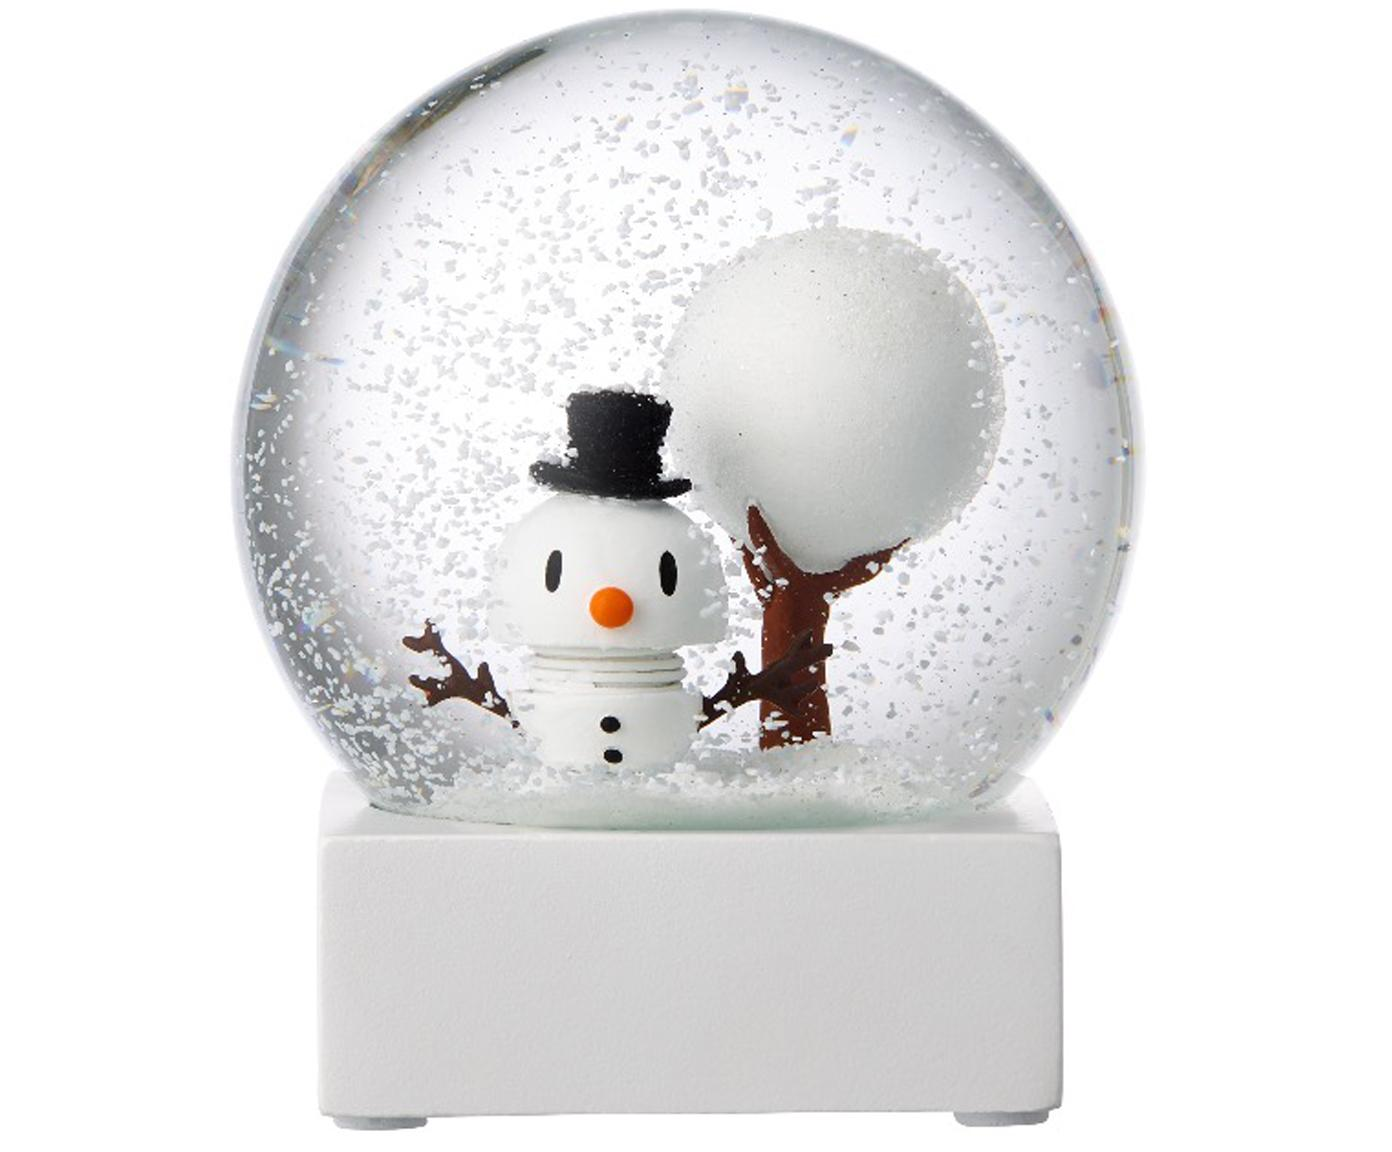 Schneekugel Snowman, Weiß, Transparent, Ø 10 x H 12 cm